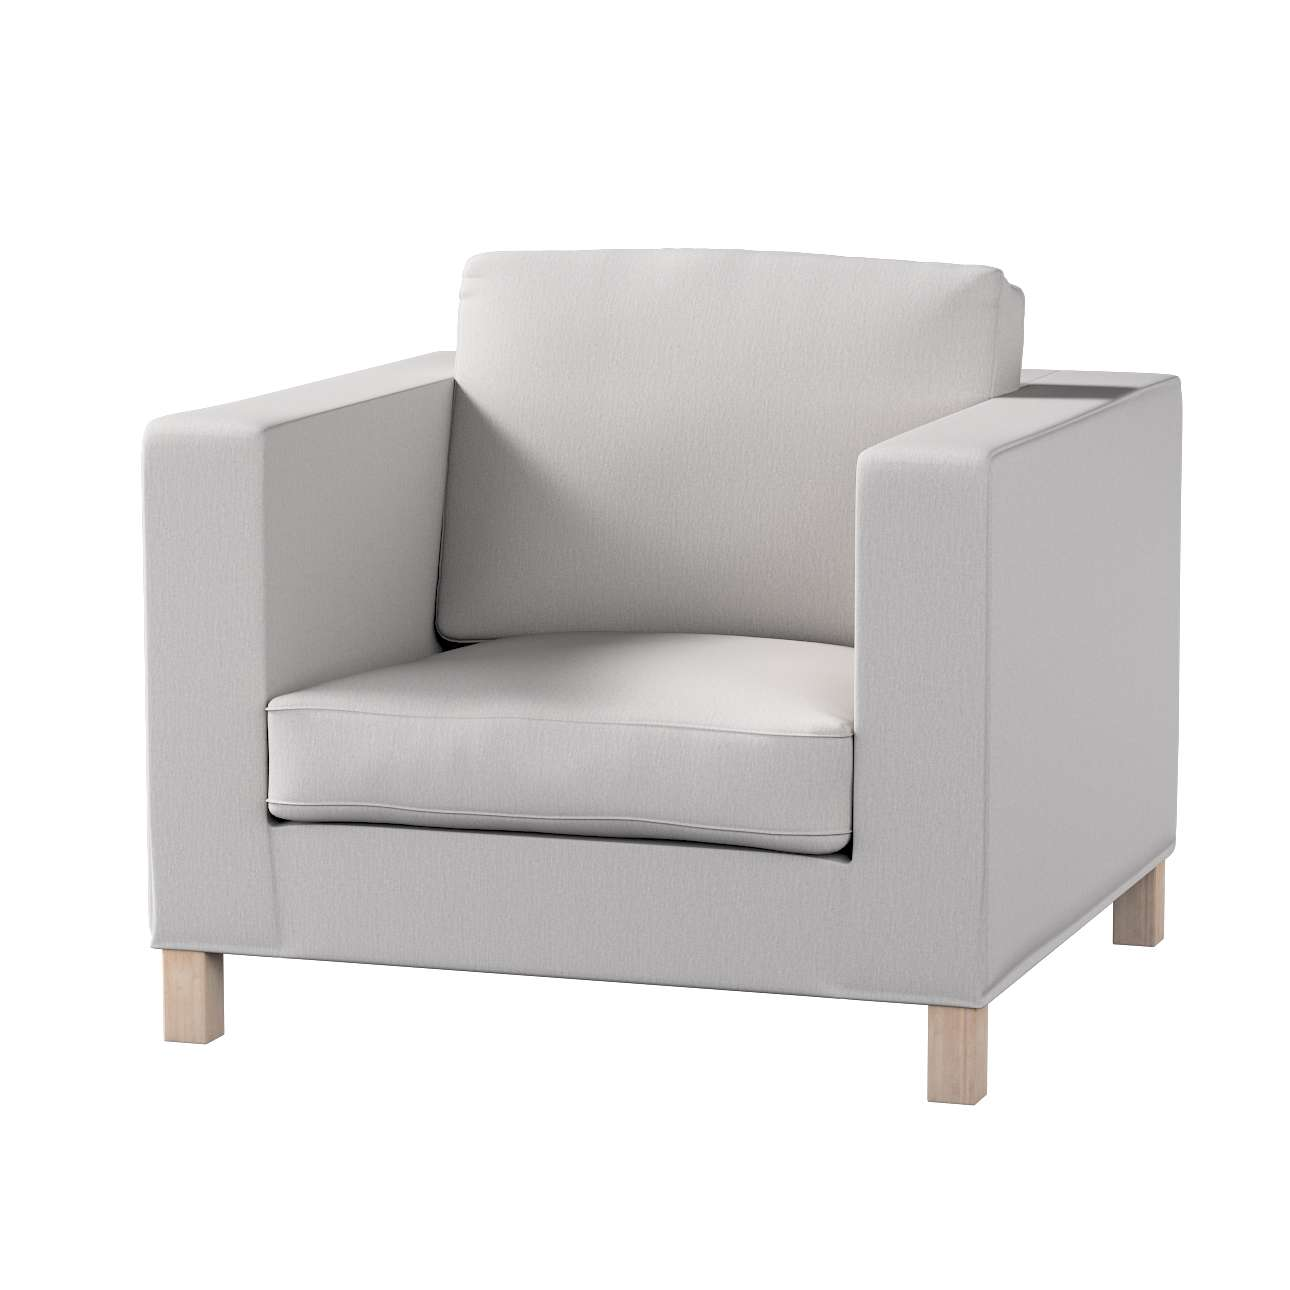 Pokrowiec na fotel Karlanda, krótki fotel Karlanda w kolekcji Chenille, tkanina: 702-23